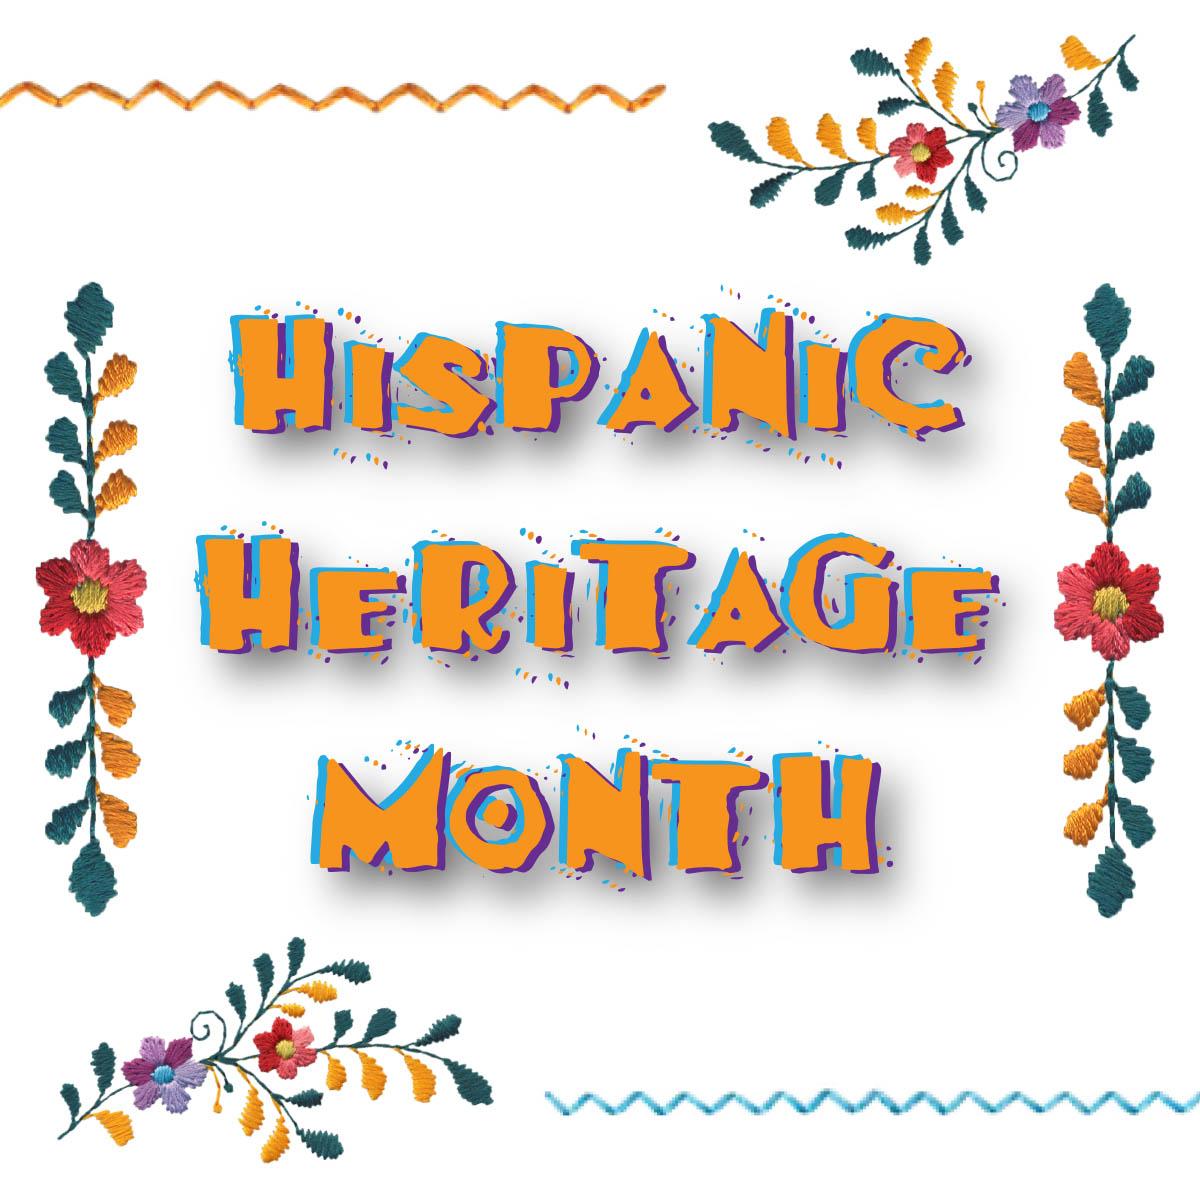 Hispanic Heritage Month Lecture